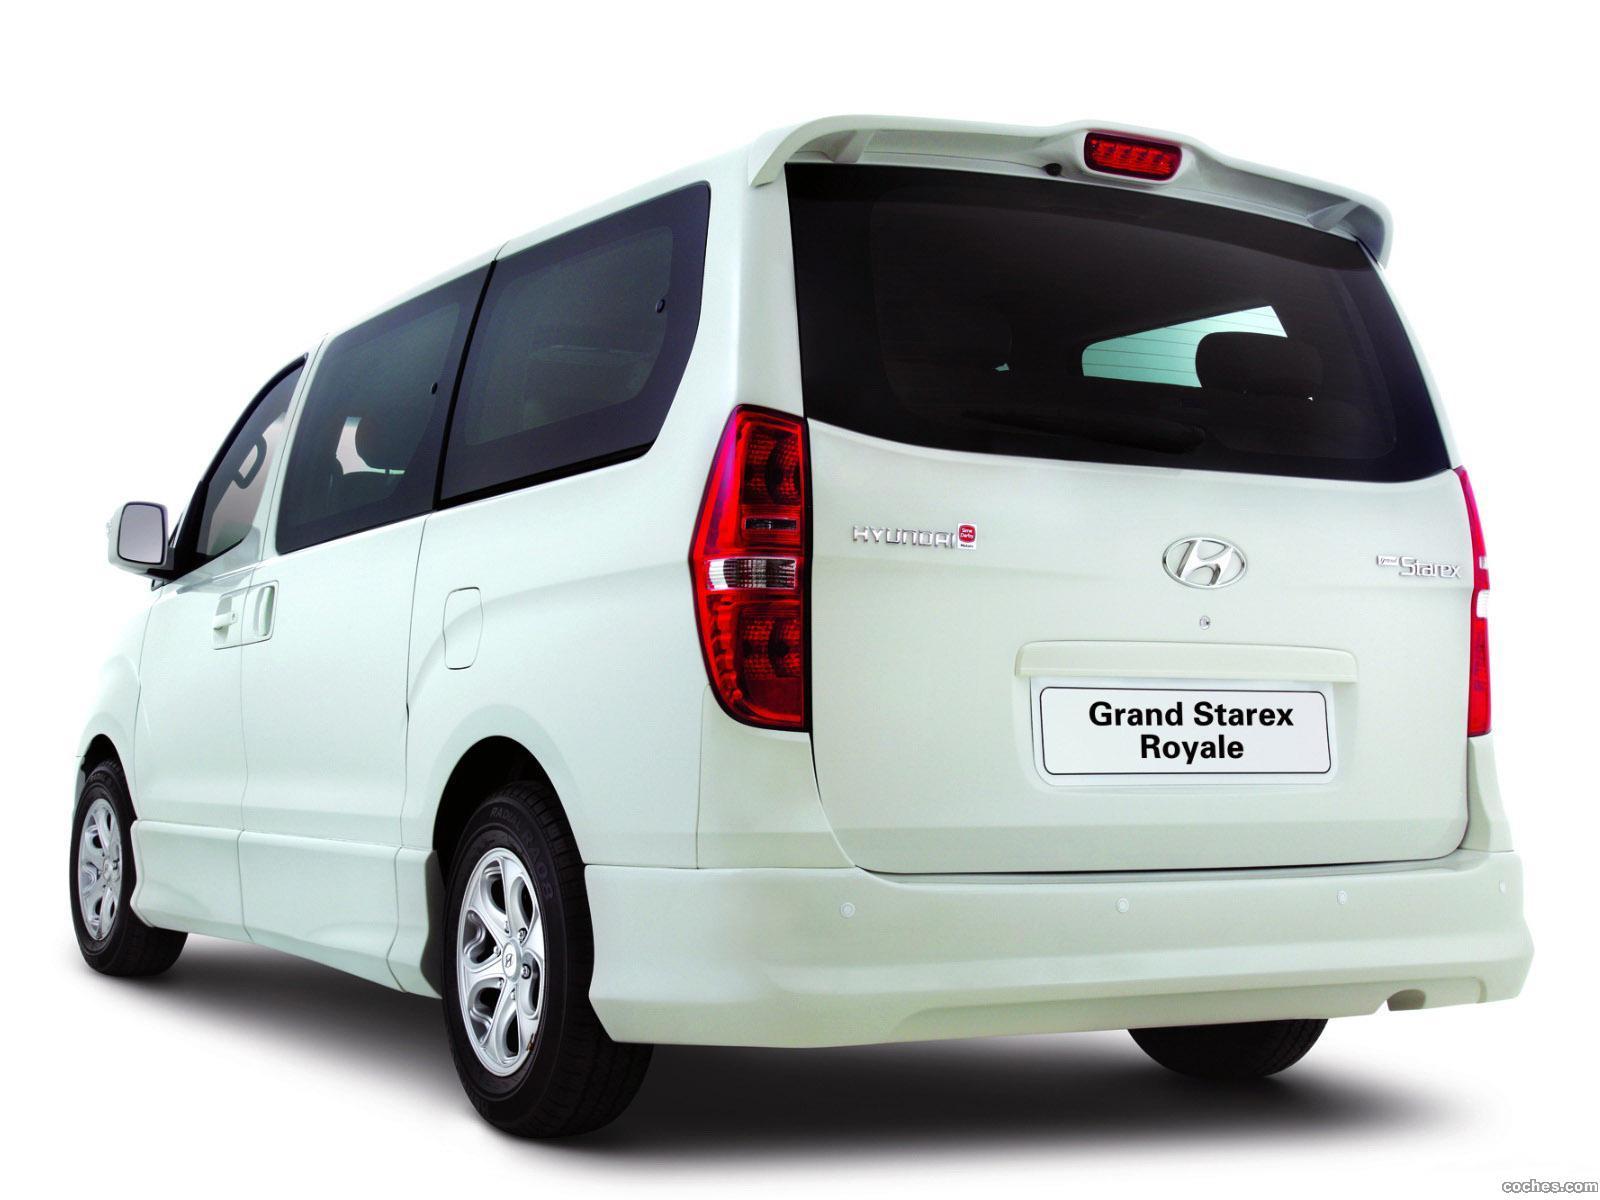 Foto 1 de Hyundai Grand Starex Royale 2009